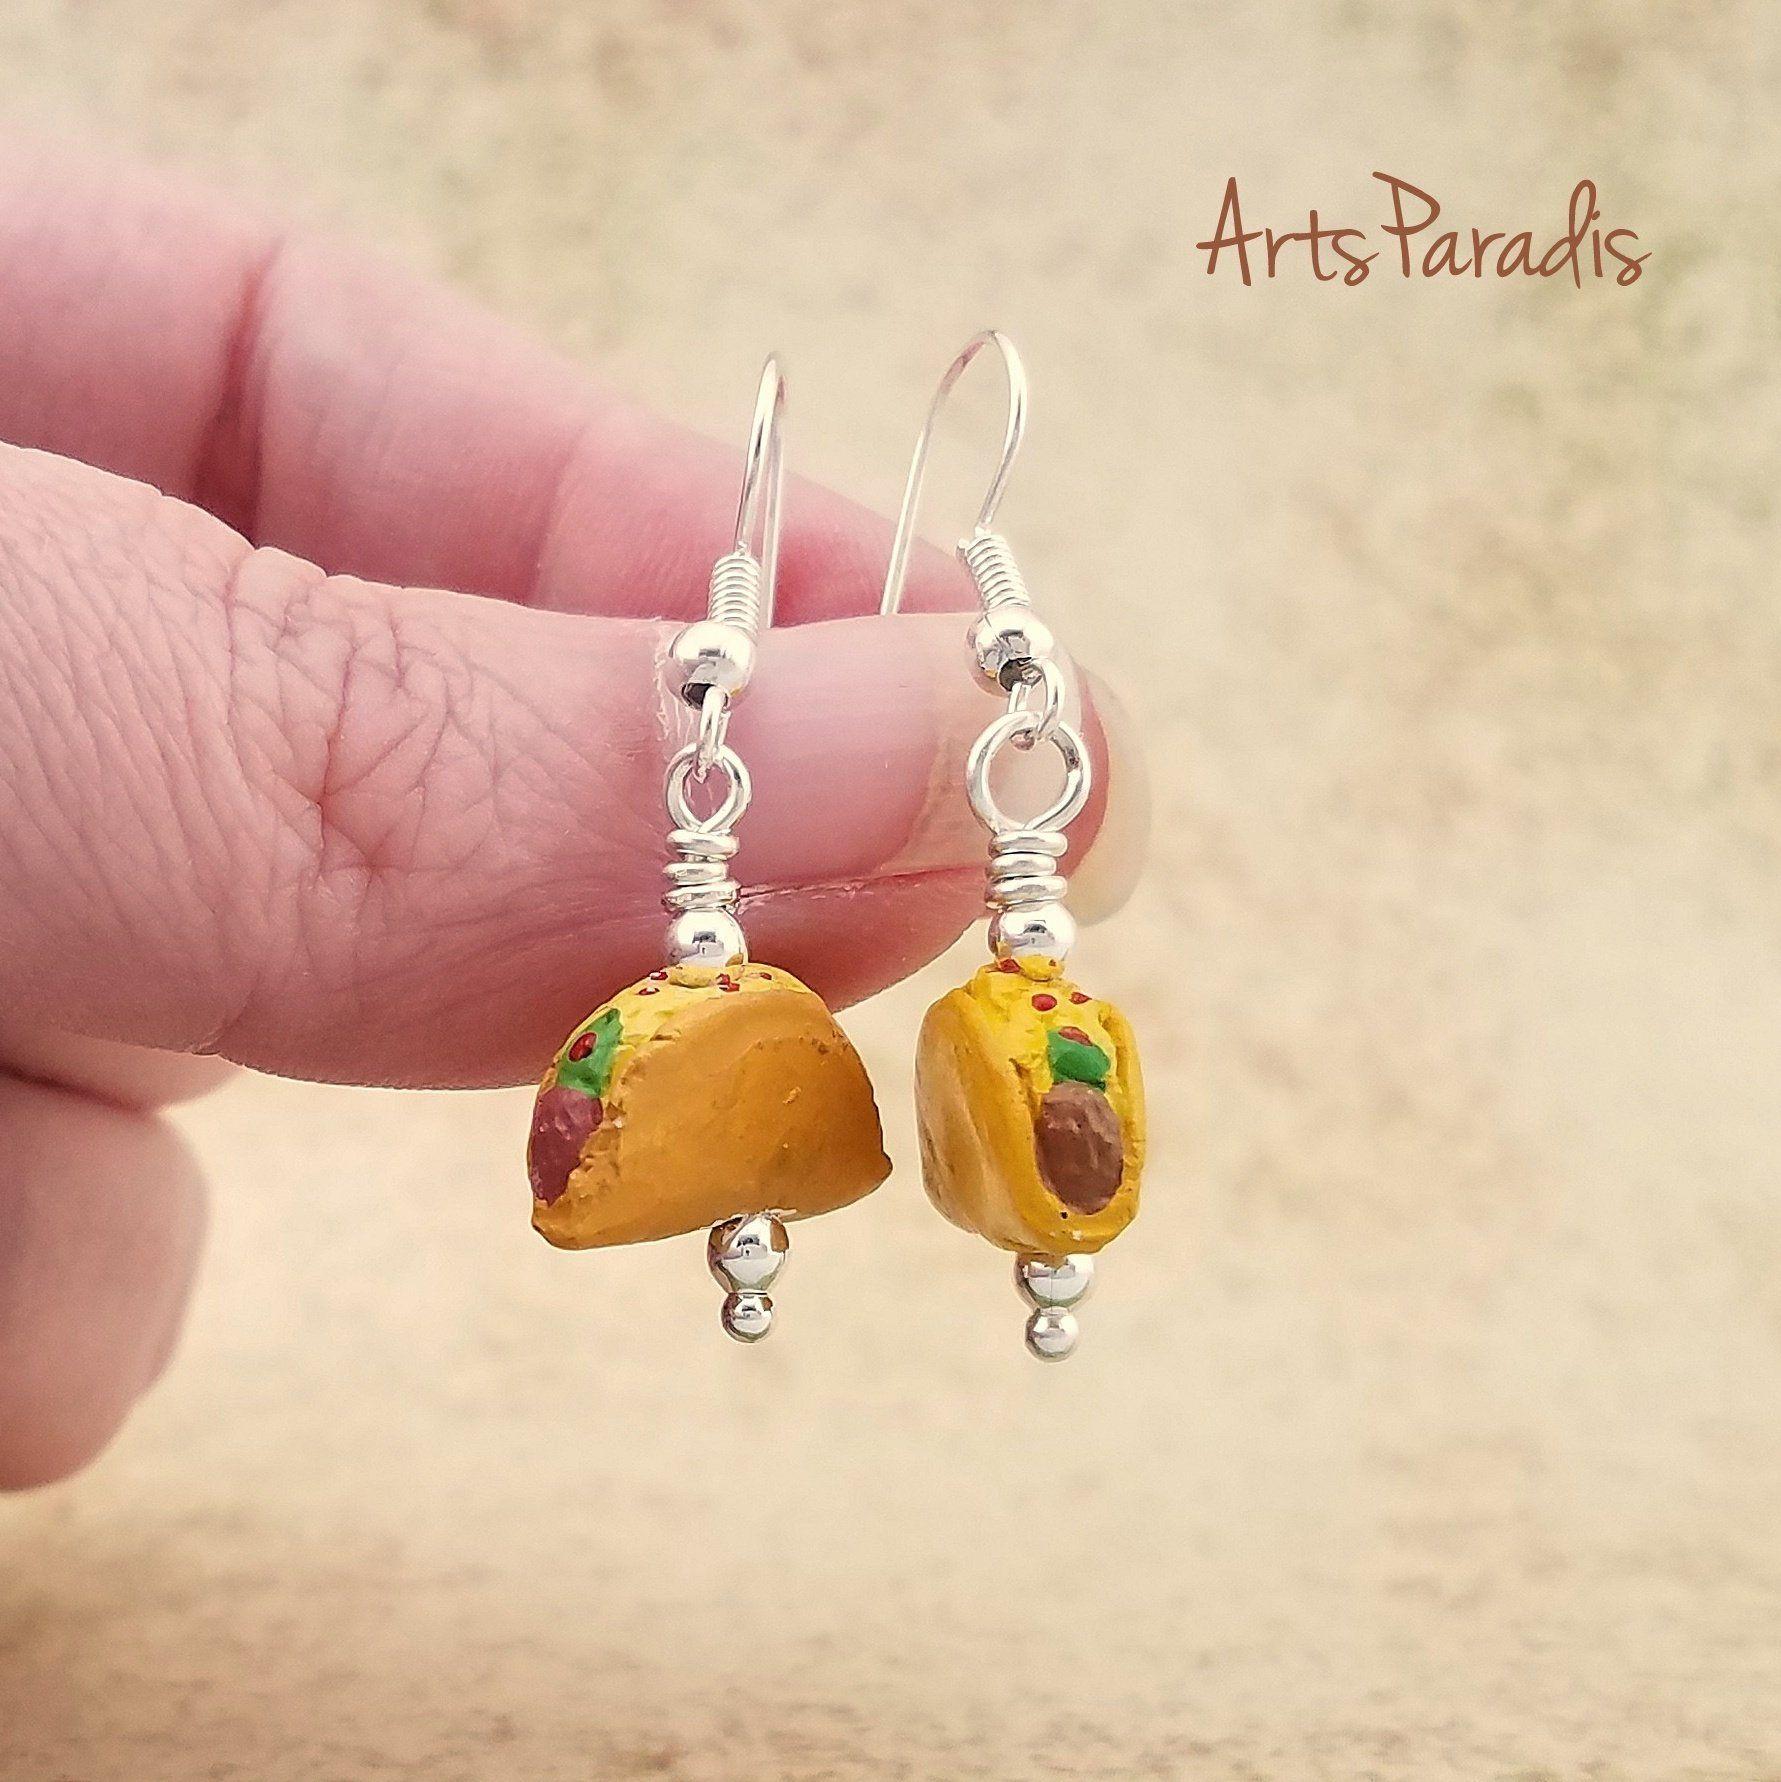 Taco hemp necklace and taco earrings